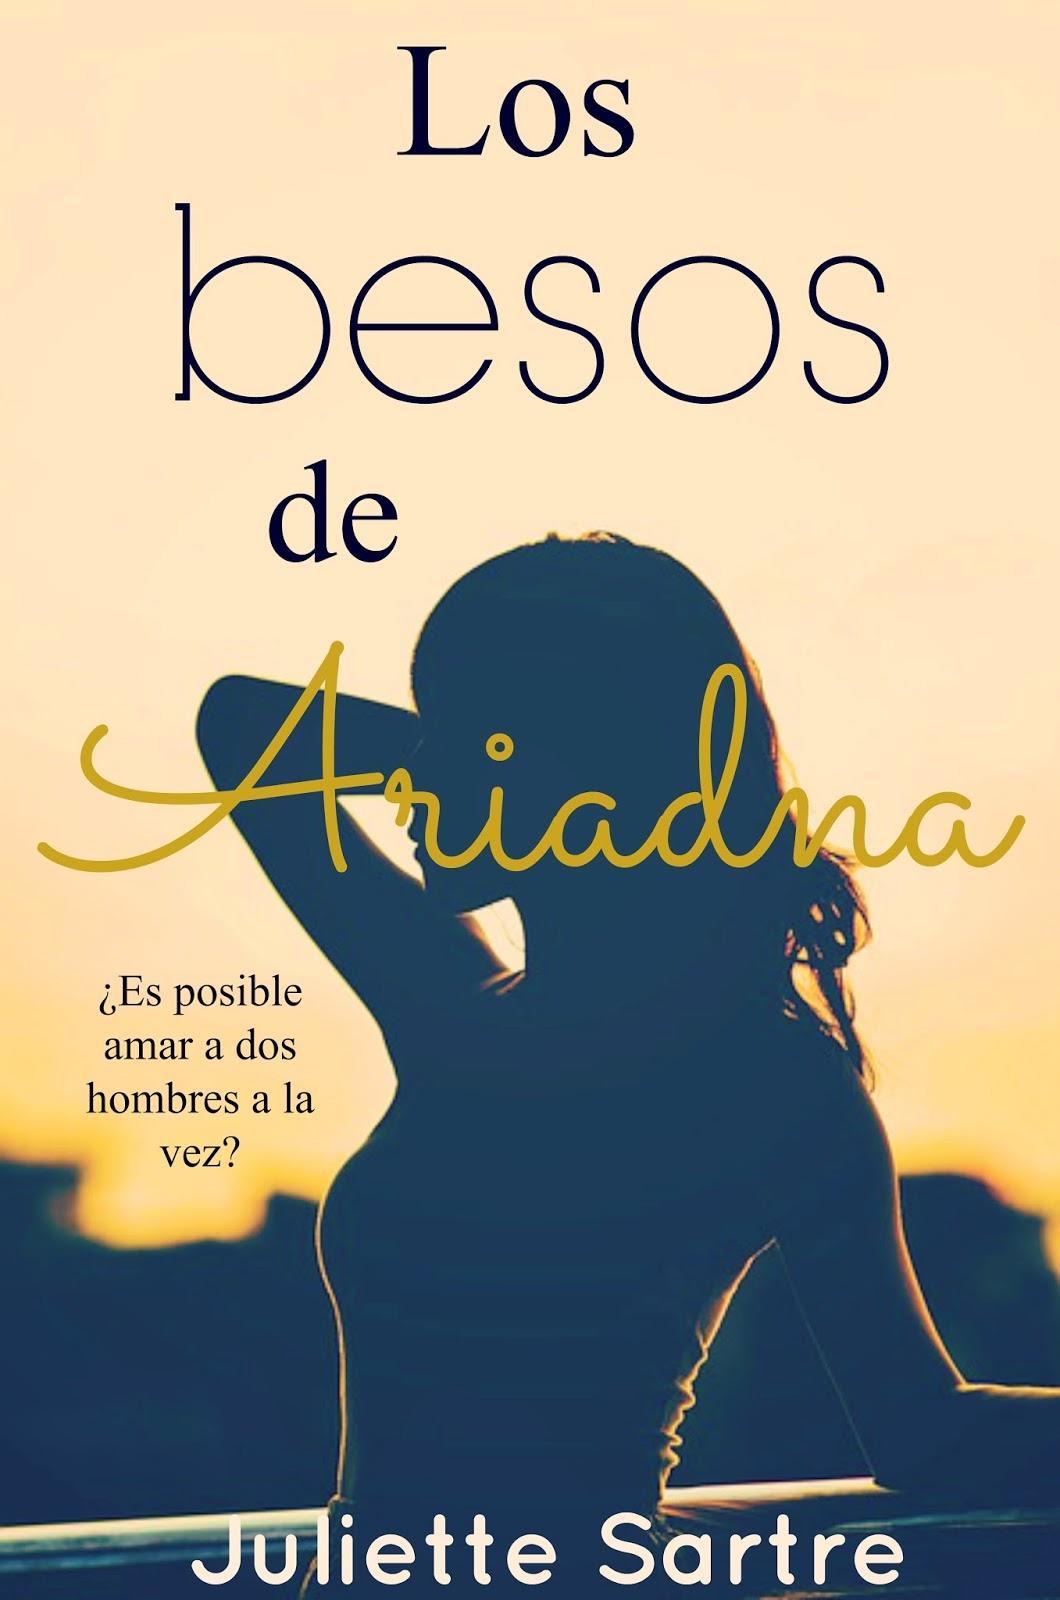 Los besos de Ariadna - Juliette Sartre (Rom) Woman-413124_640